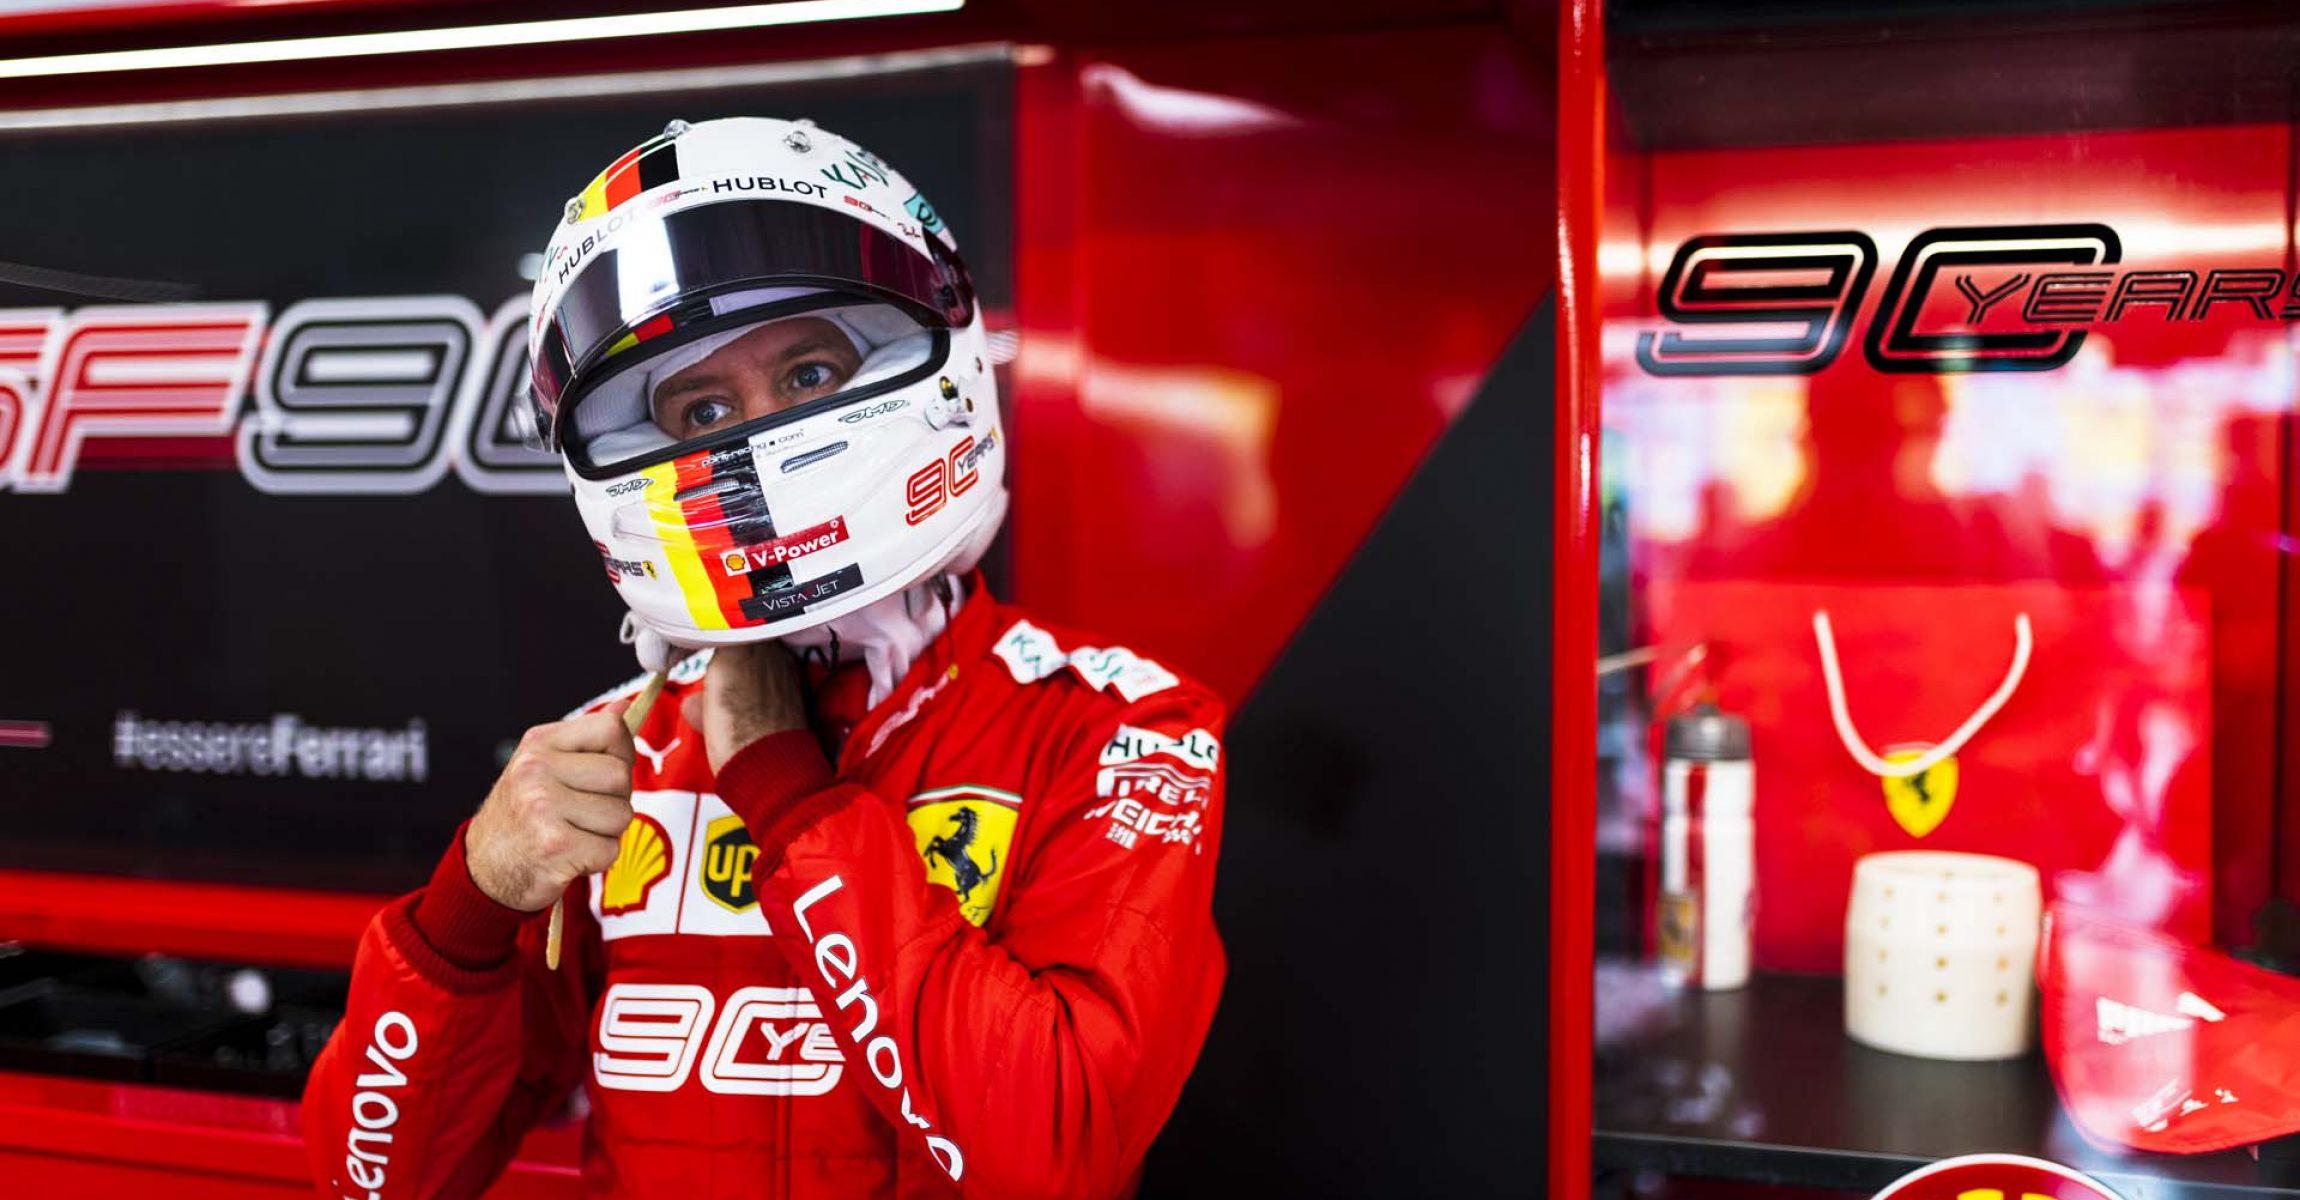 Sebastian Vettel, Ferrari, Singapore Grand Prix 2019